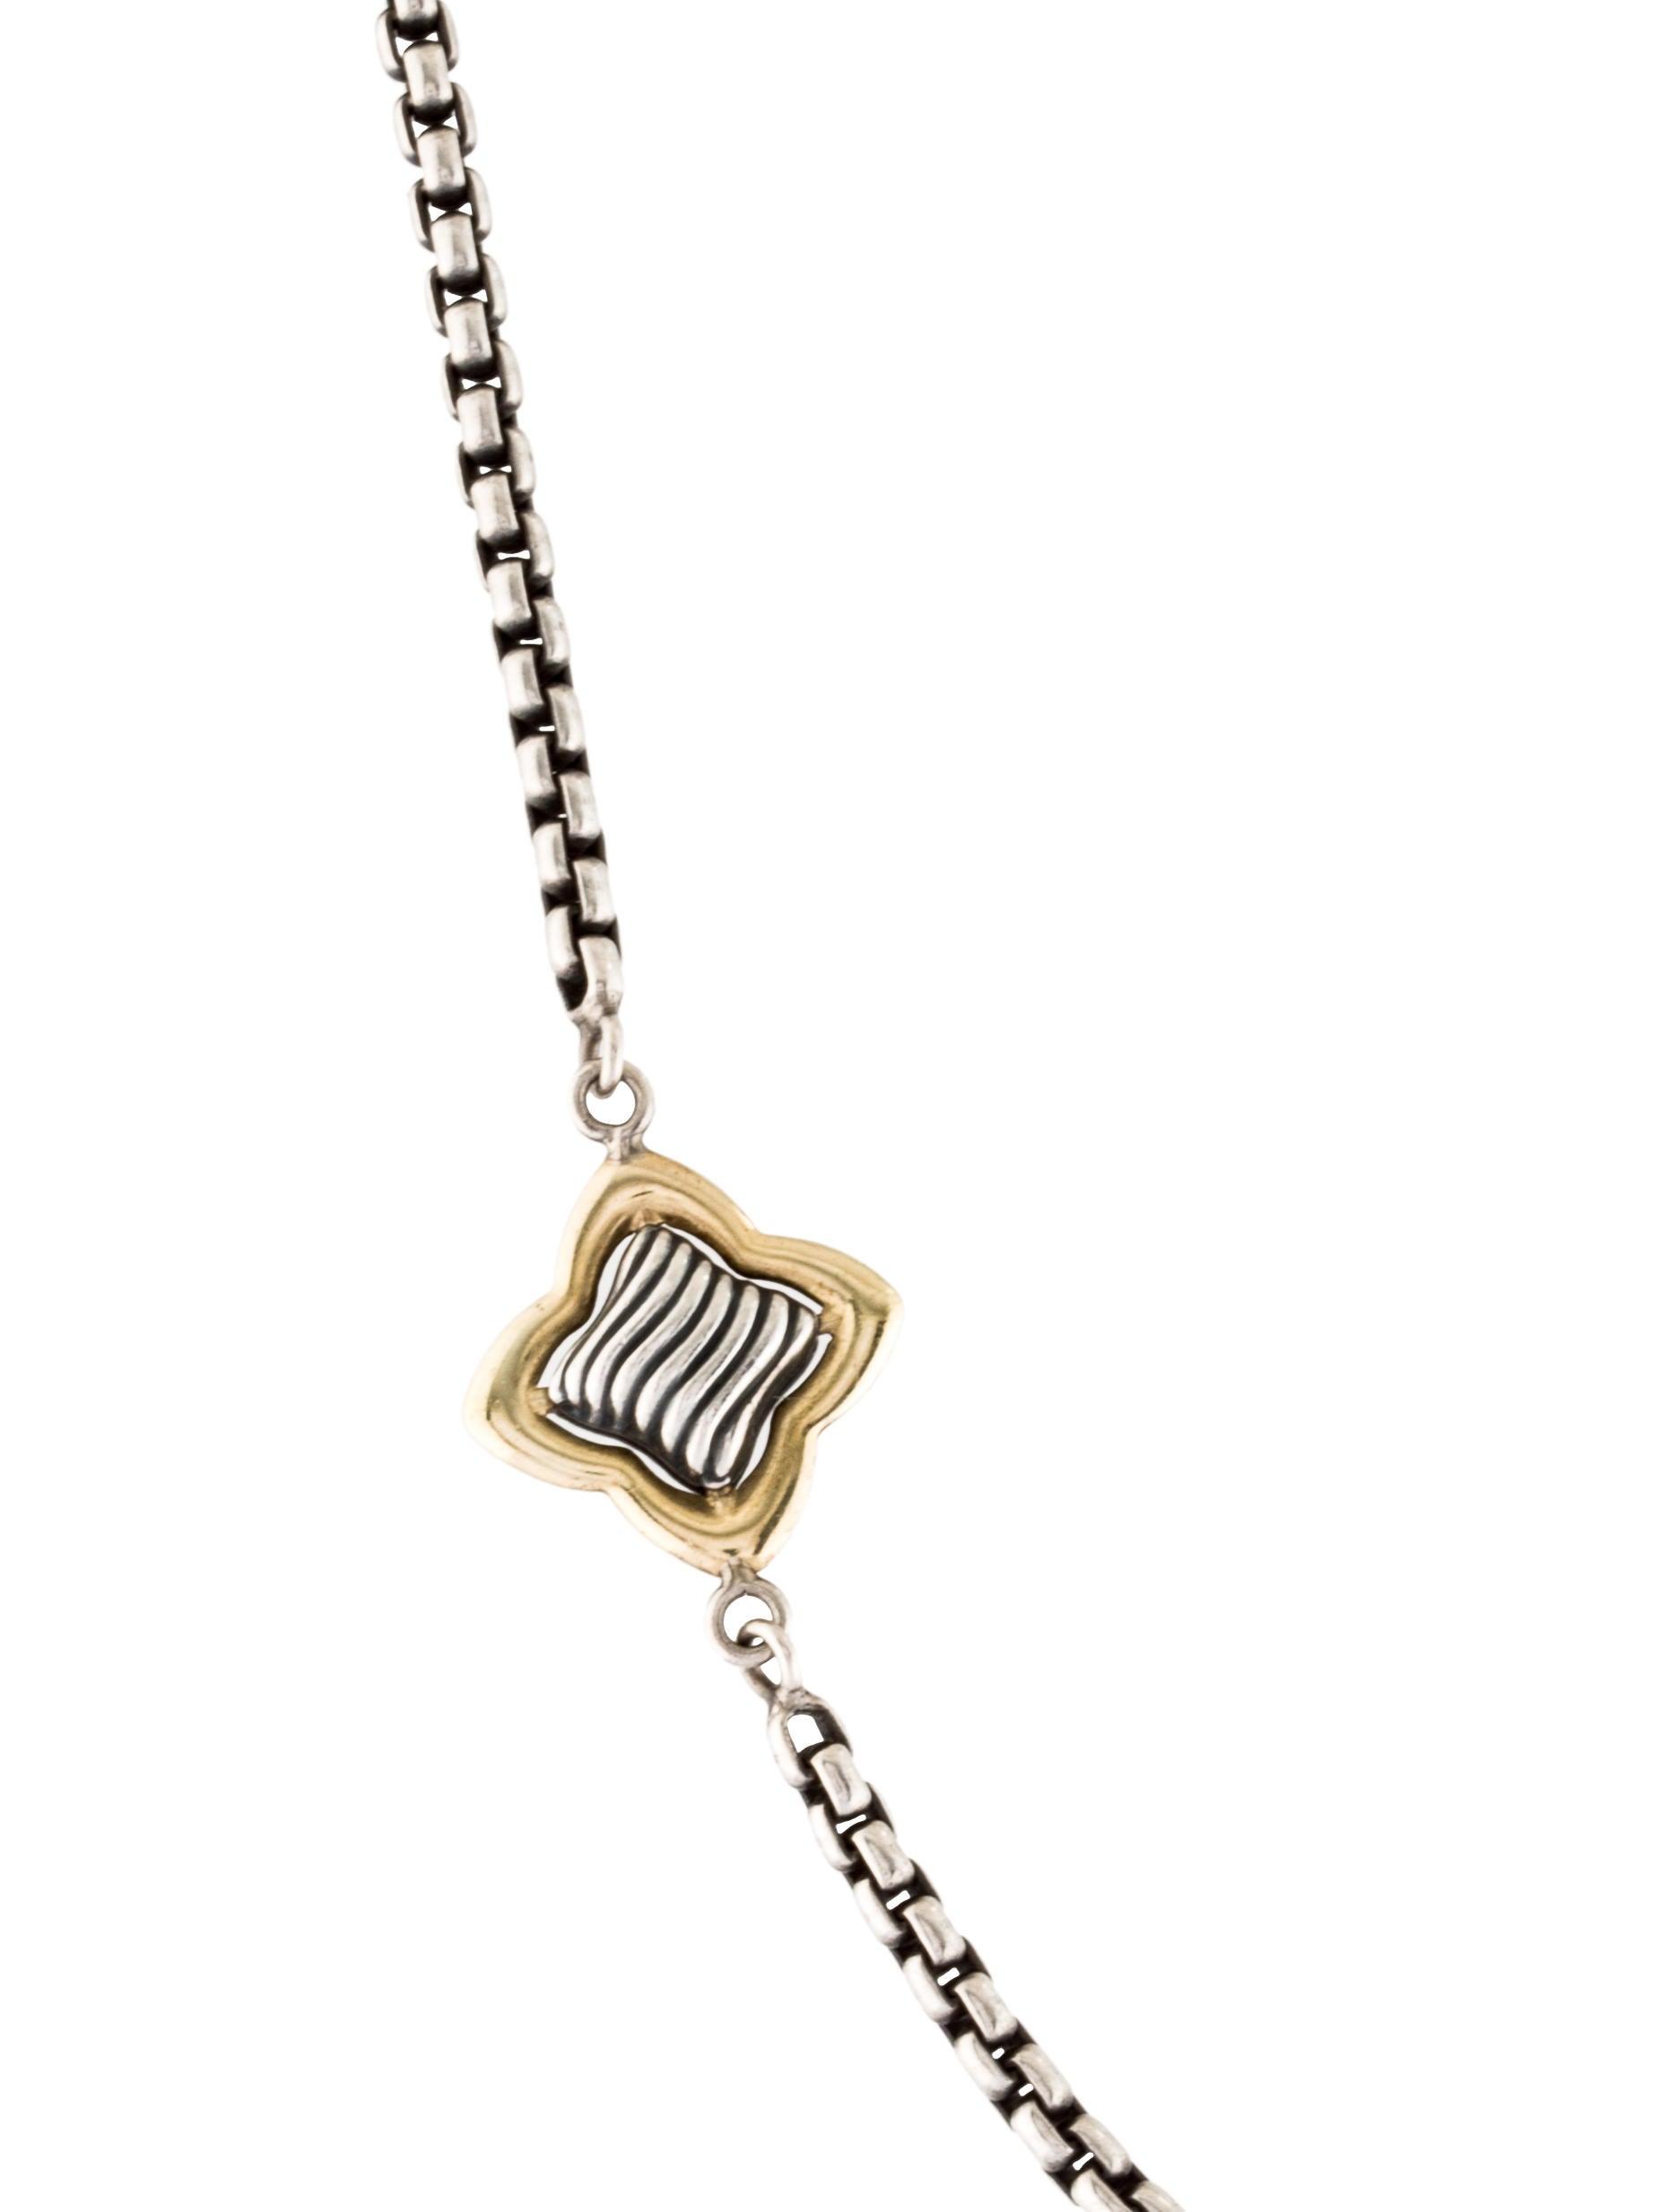 David Yurman Pearl Quatrefoil Station Necklace  Necklaces. Open Bangles. Ear Cuff Diamond. Sterling Silver Diamond Bangle. Birthstone Rings. Chandelier Ceiling Medallion. Beads Bangles. Garnet Stud Earrings. Pave Stud Earrings